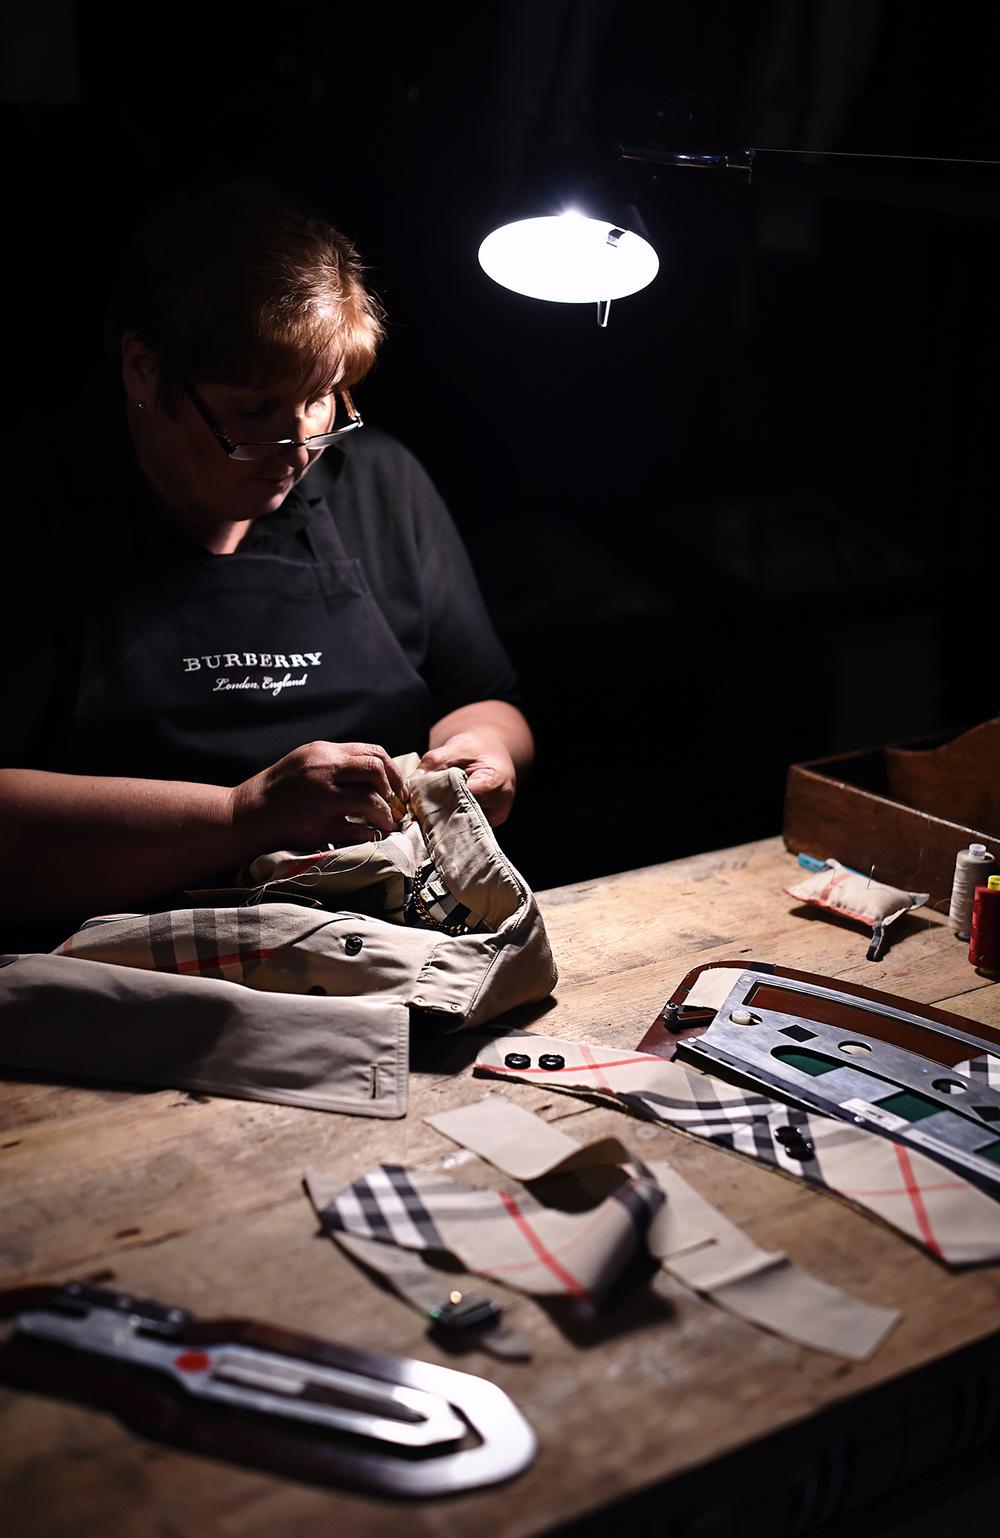 Burberry celebrates craftsmanship and personalisation at its 121 Regent Street flagship_002.jpg